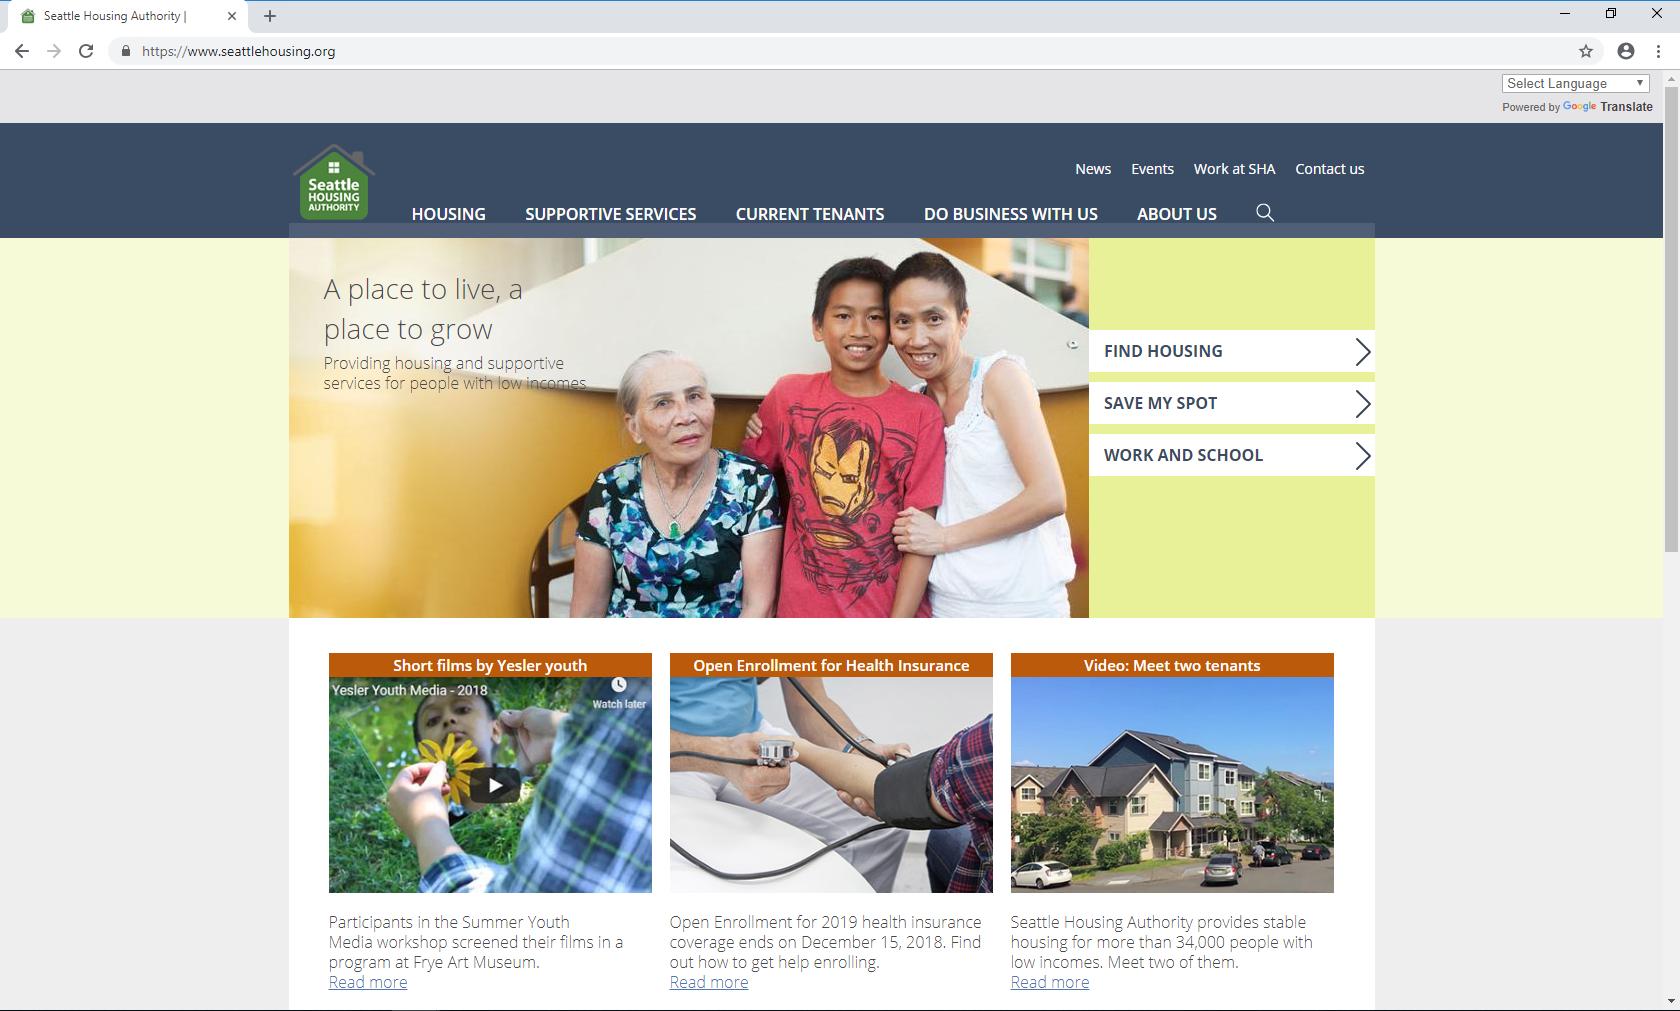 Screenshot of seattlehousing.org home page in English